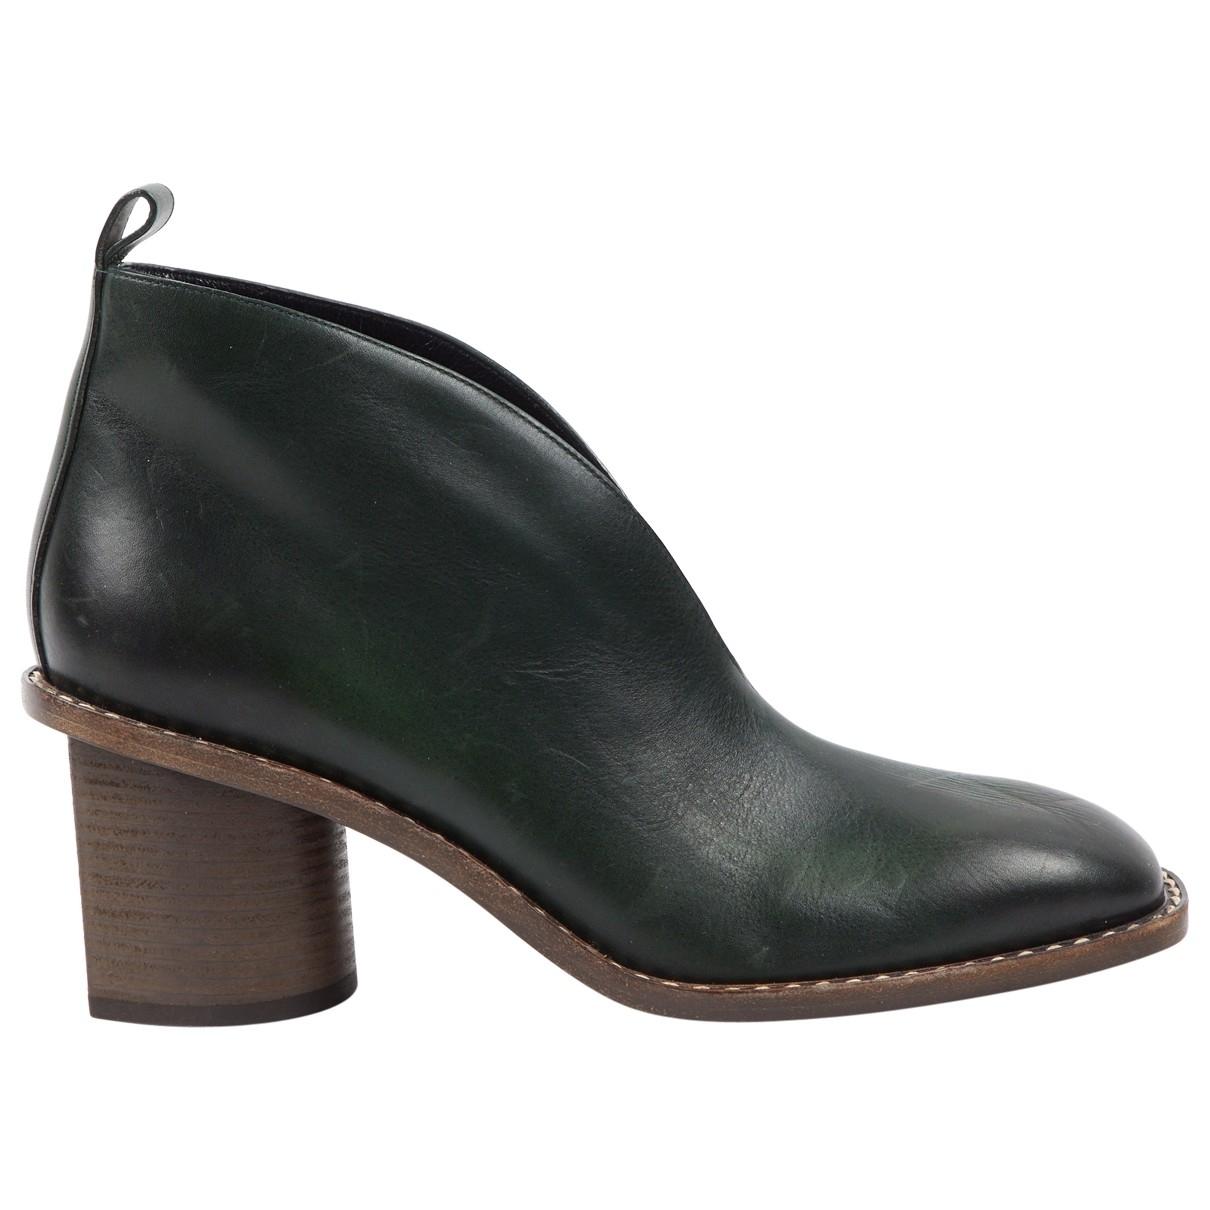 Celine \N Stiefel in  Gruen Leder